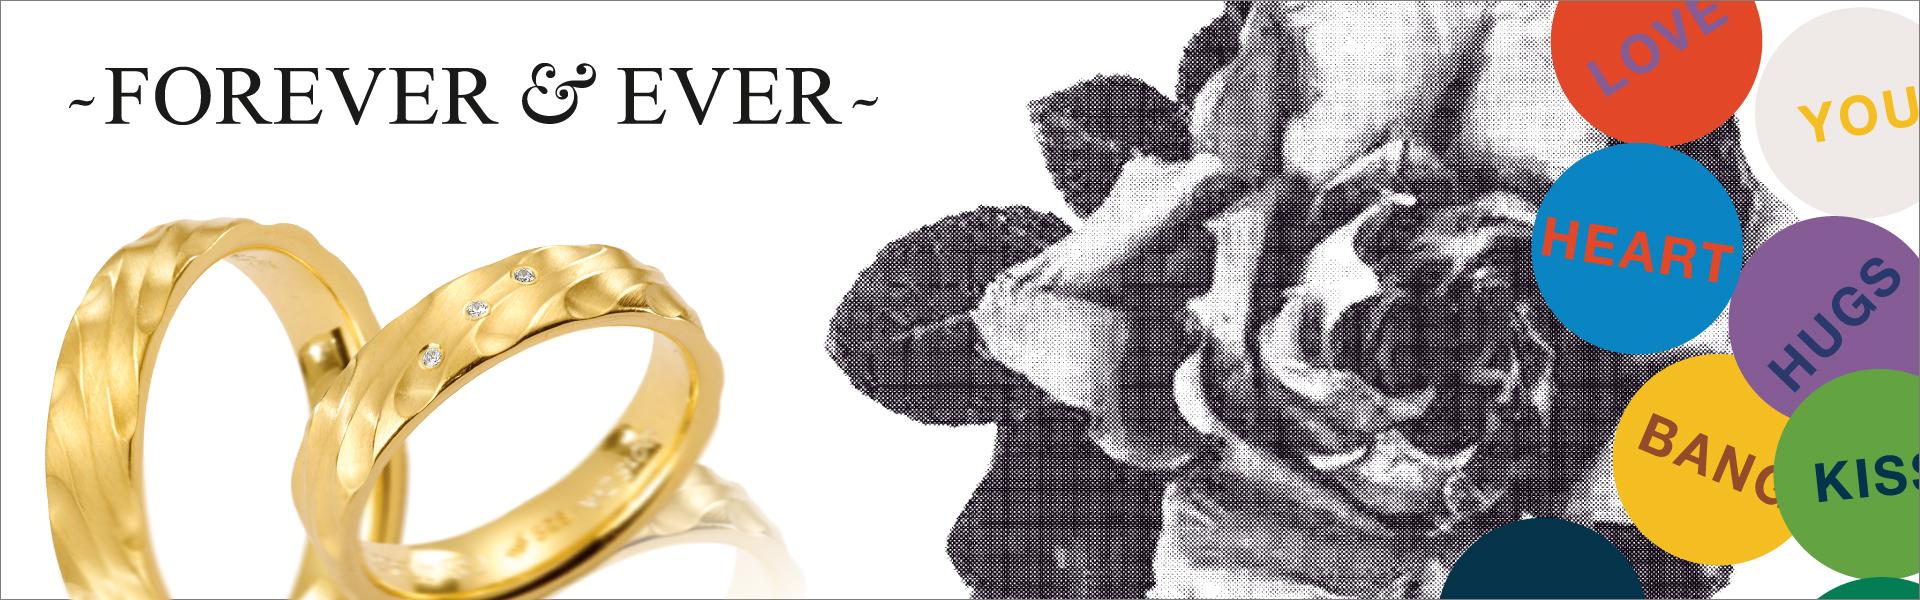 Forever & Ever